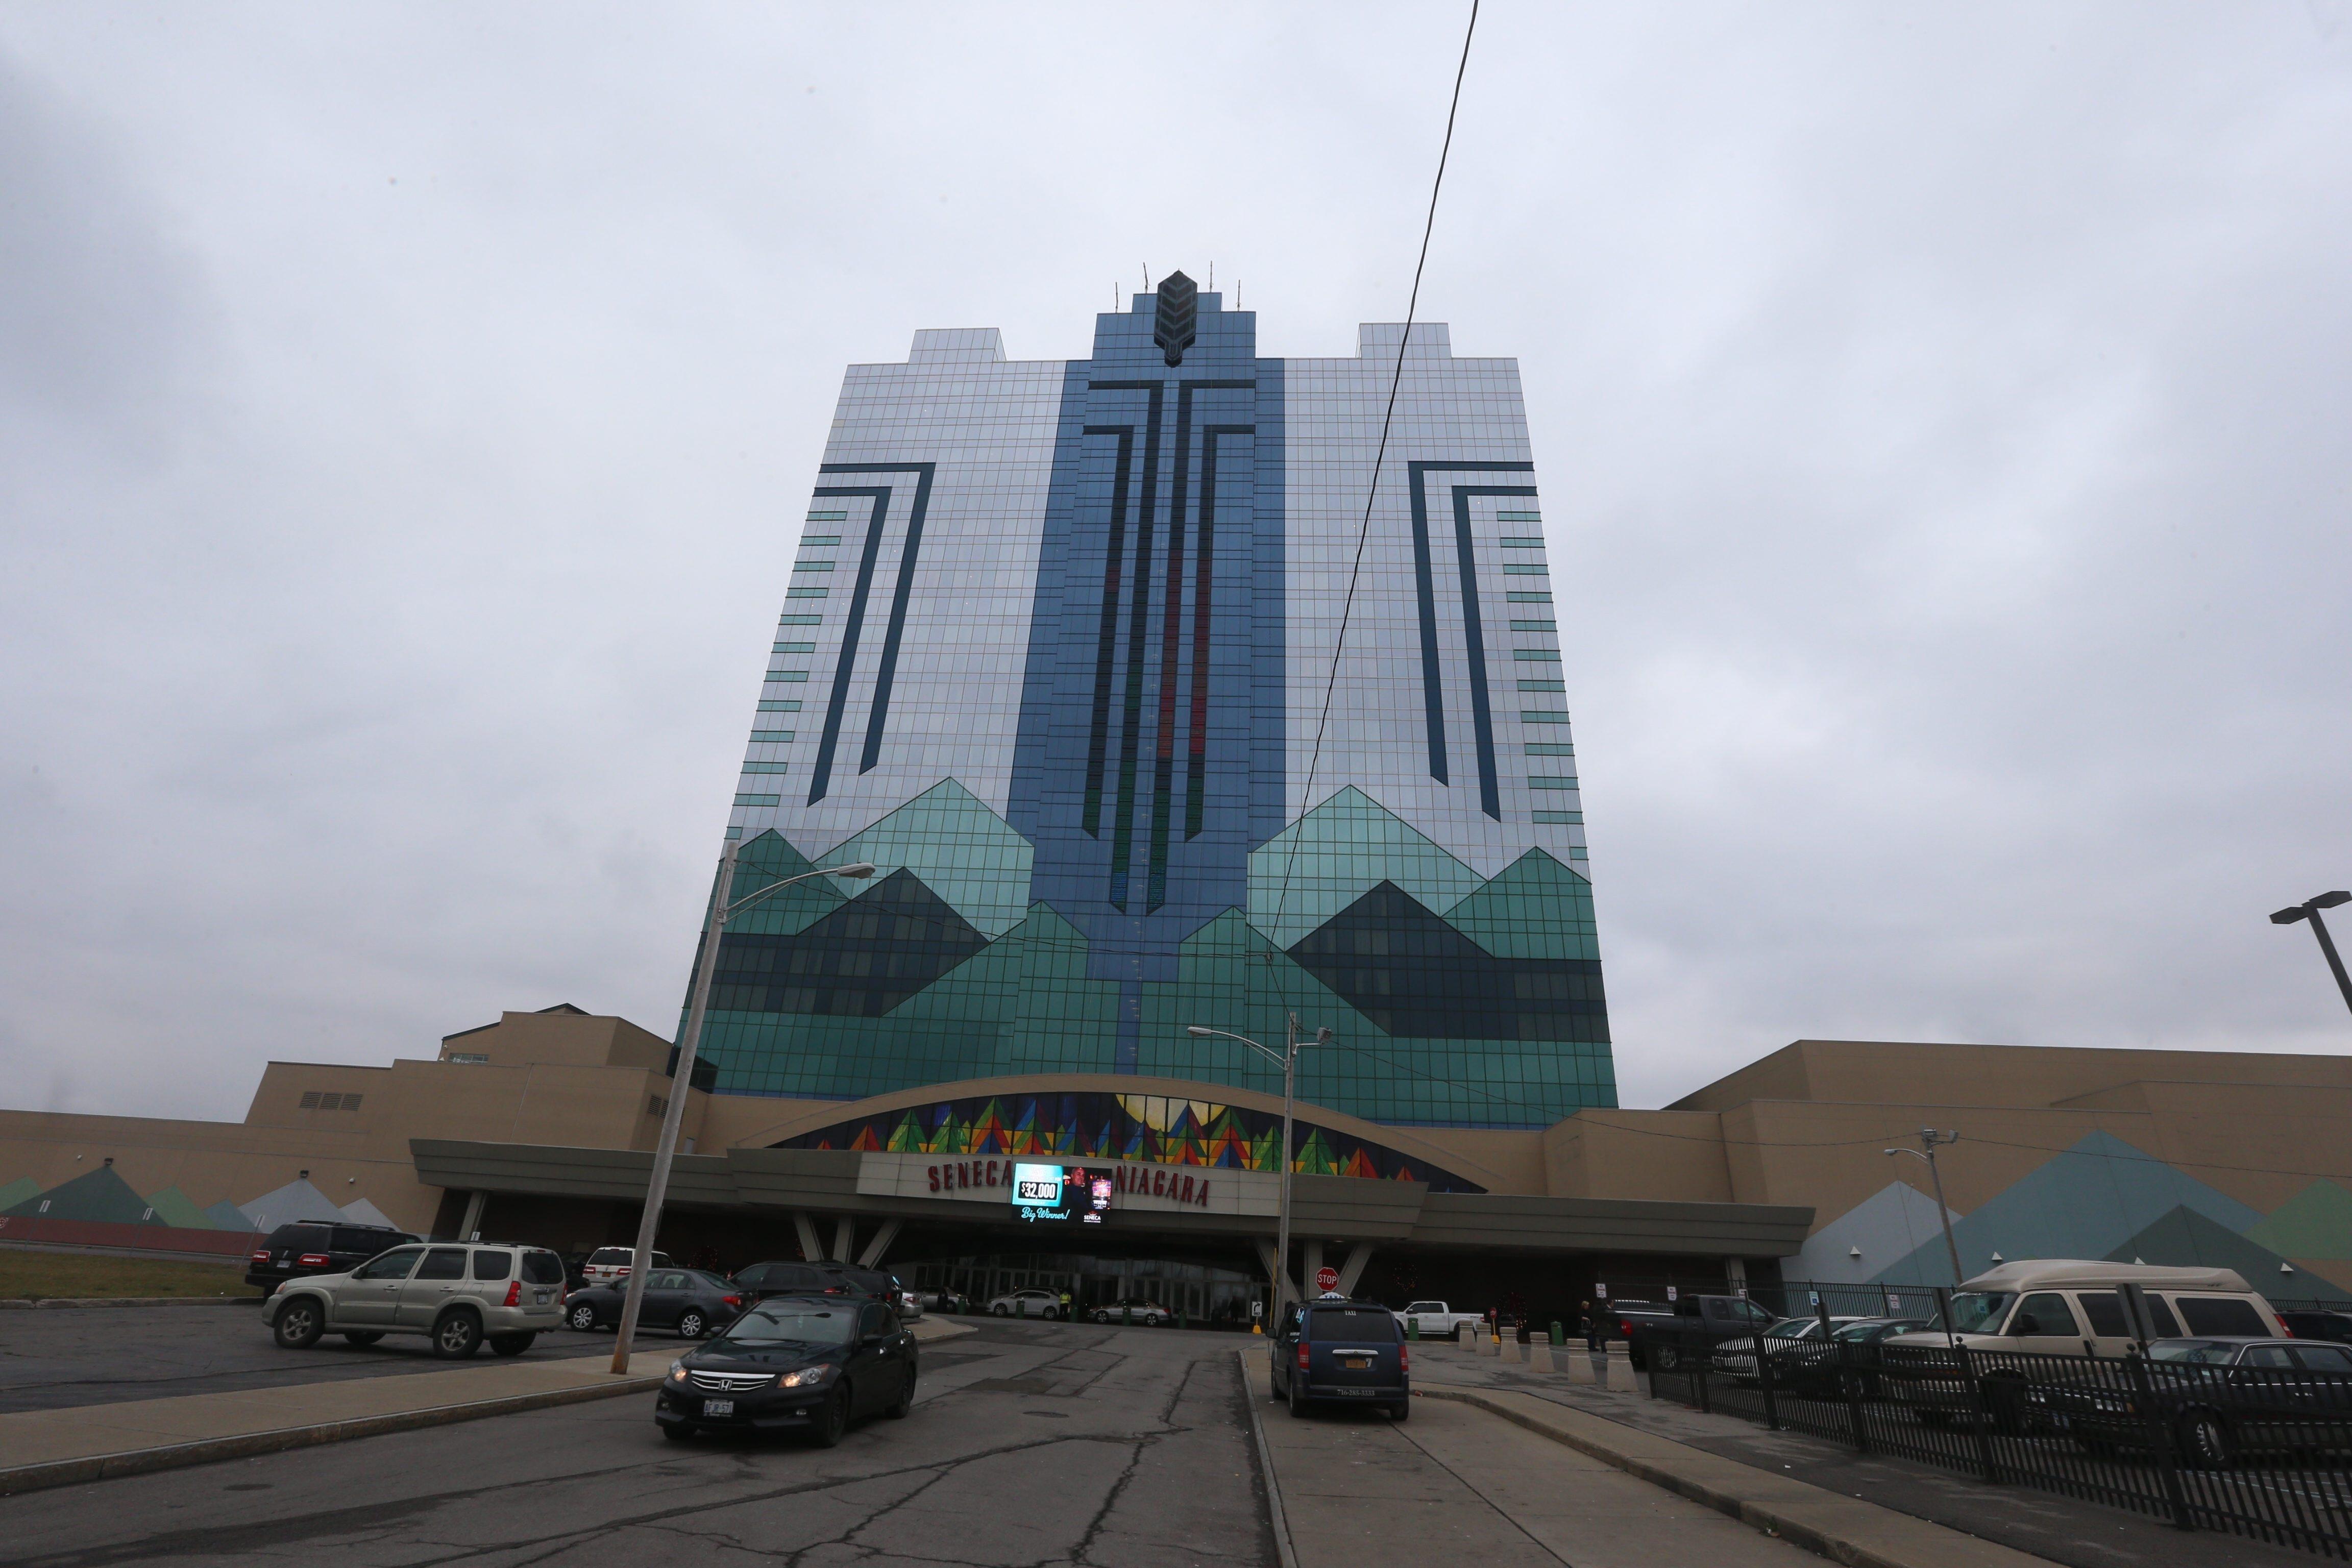 The city lost its convention center when the Seneca Niagara Casino took over the site. (John Hickey/News file photo)